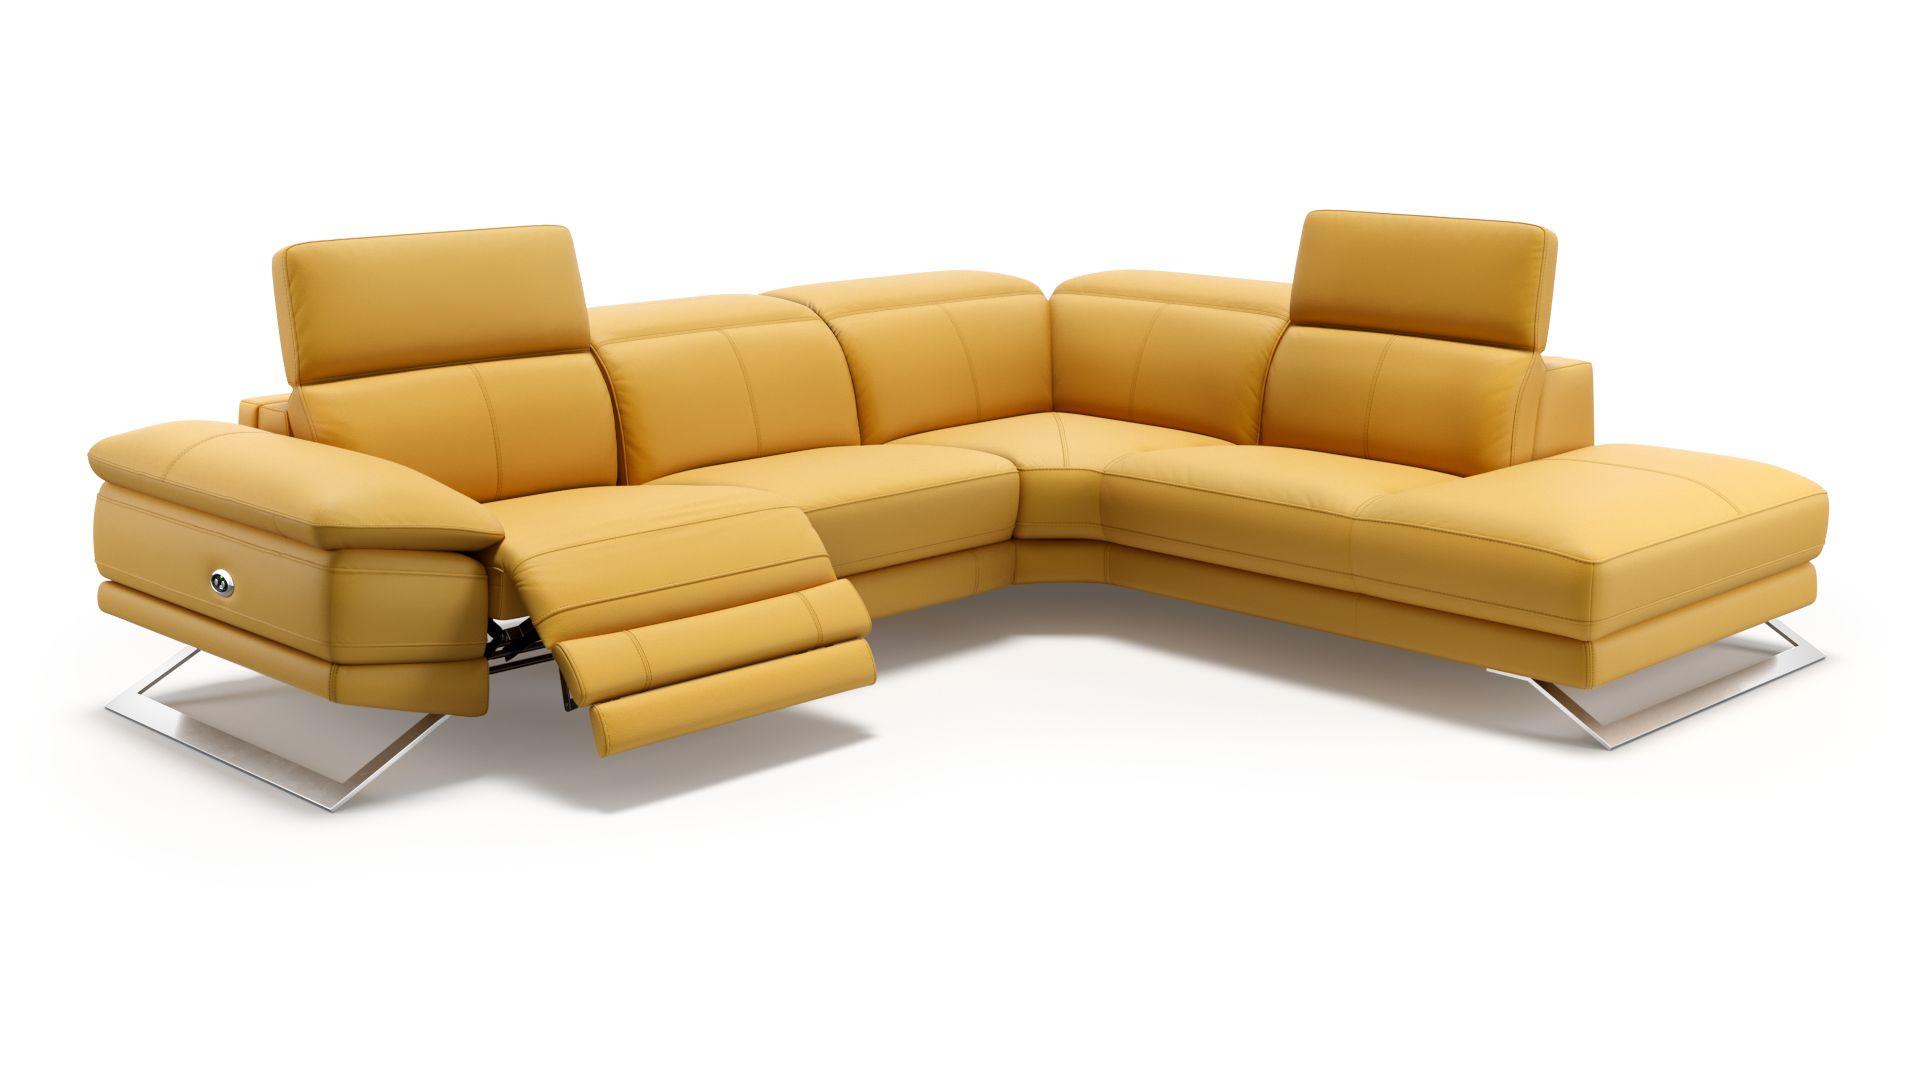 Designer Polsterecke Mit Relaxfunktion Sofanella